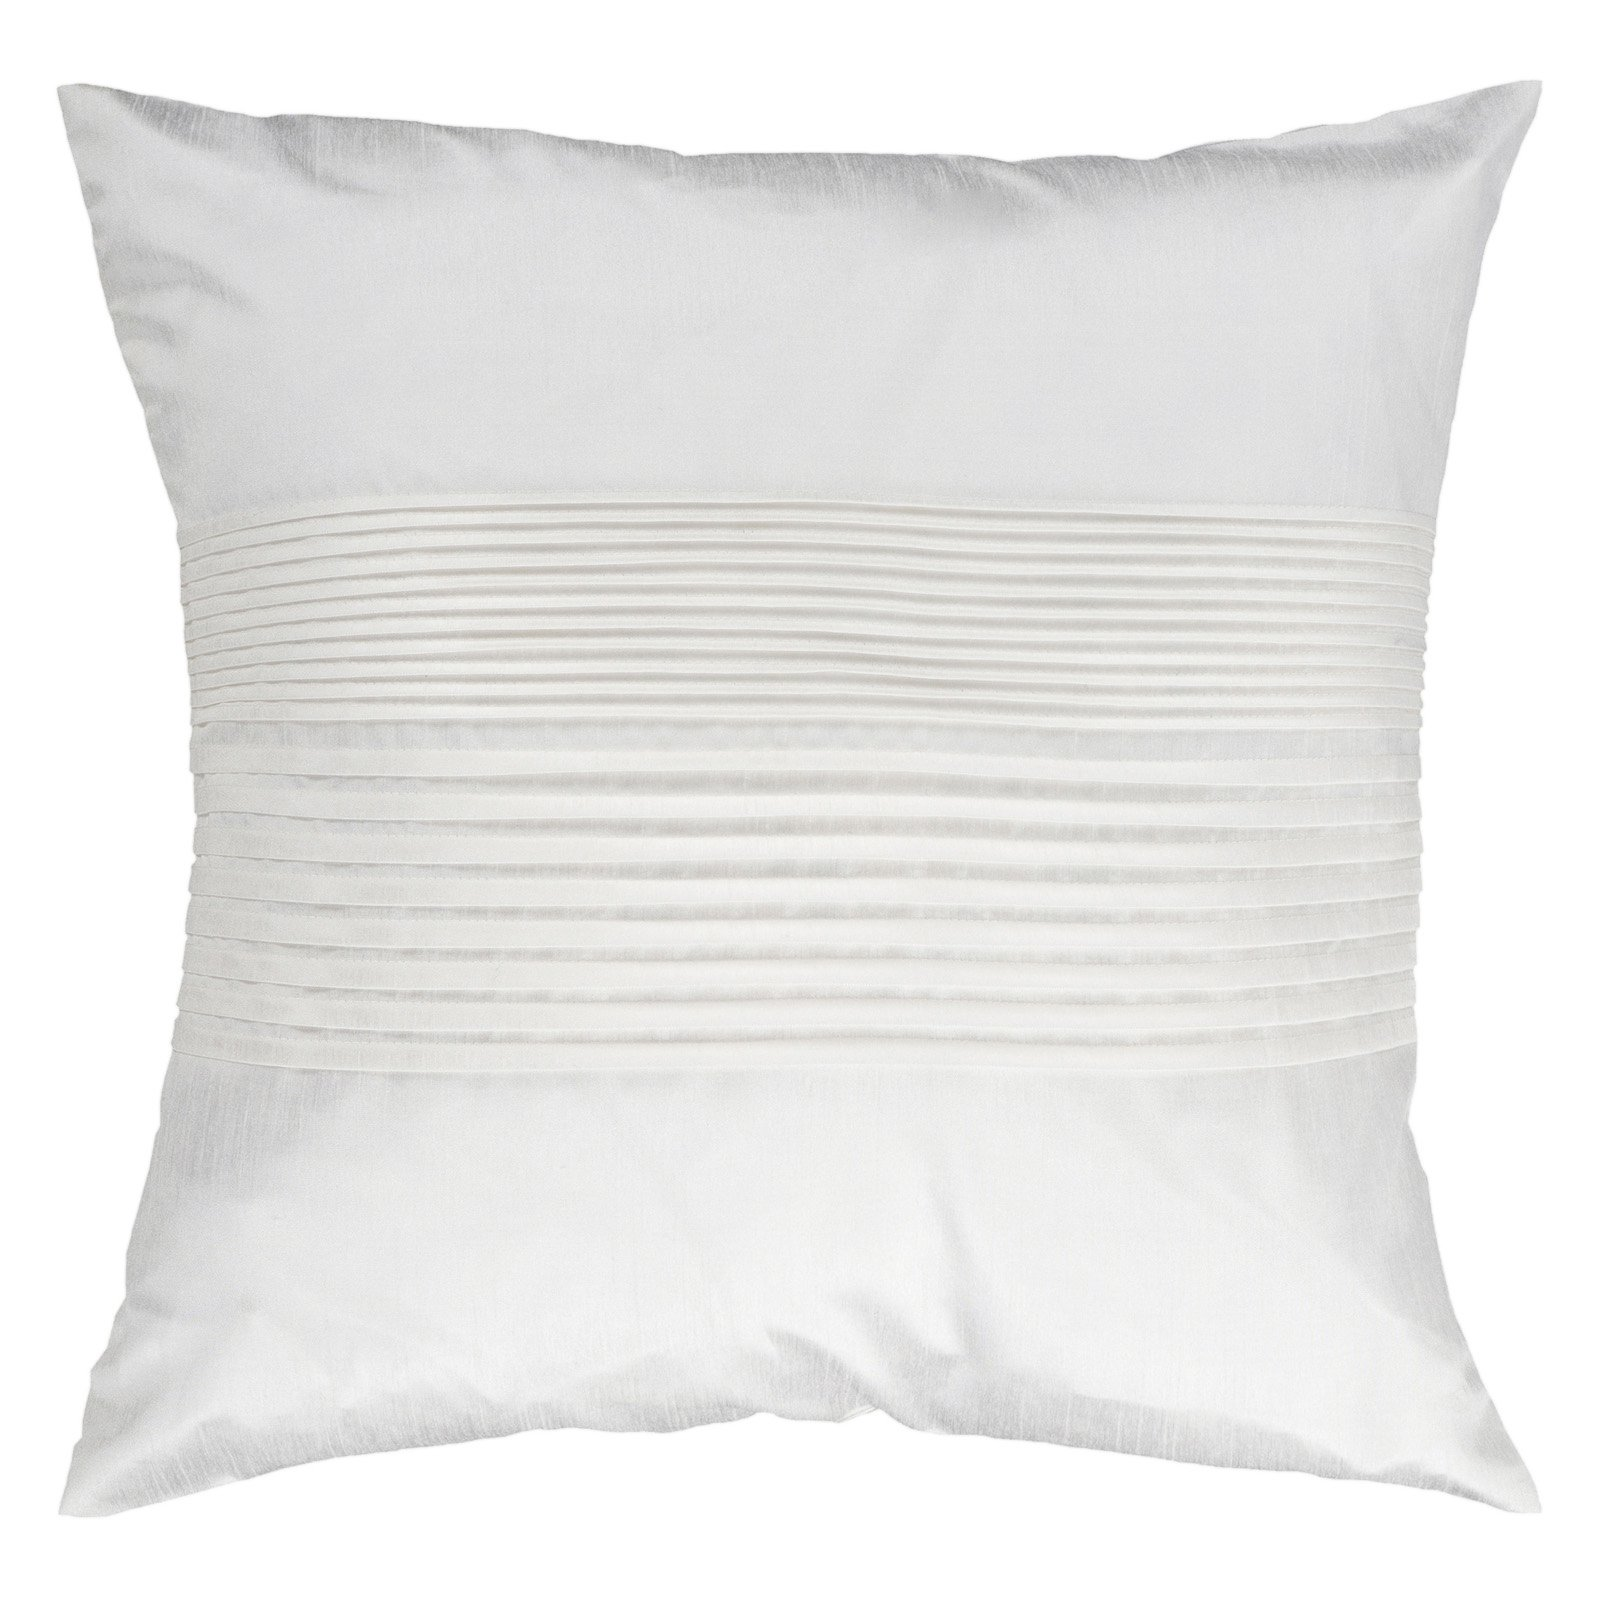 Surya Tracks Decorative Pillow - White